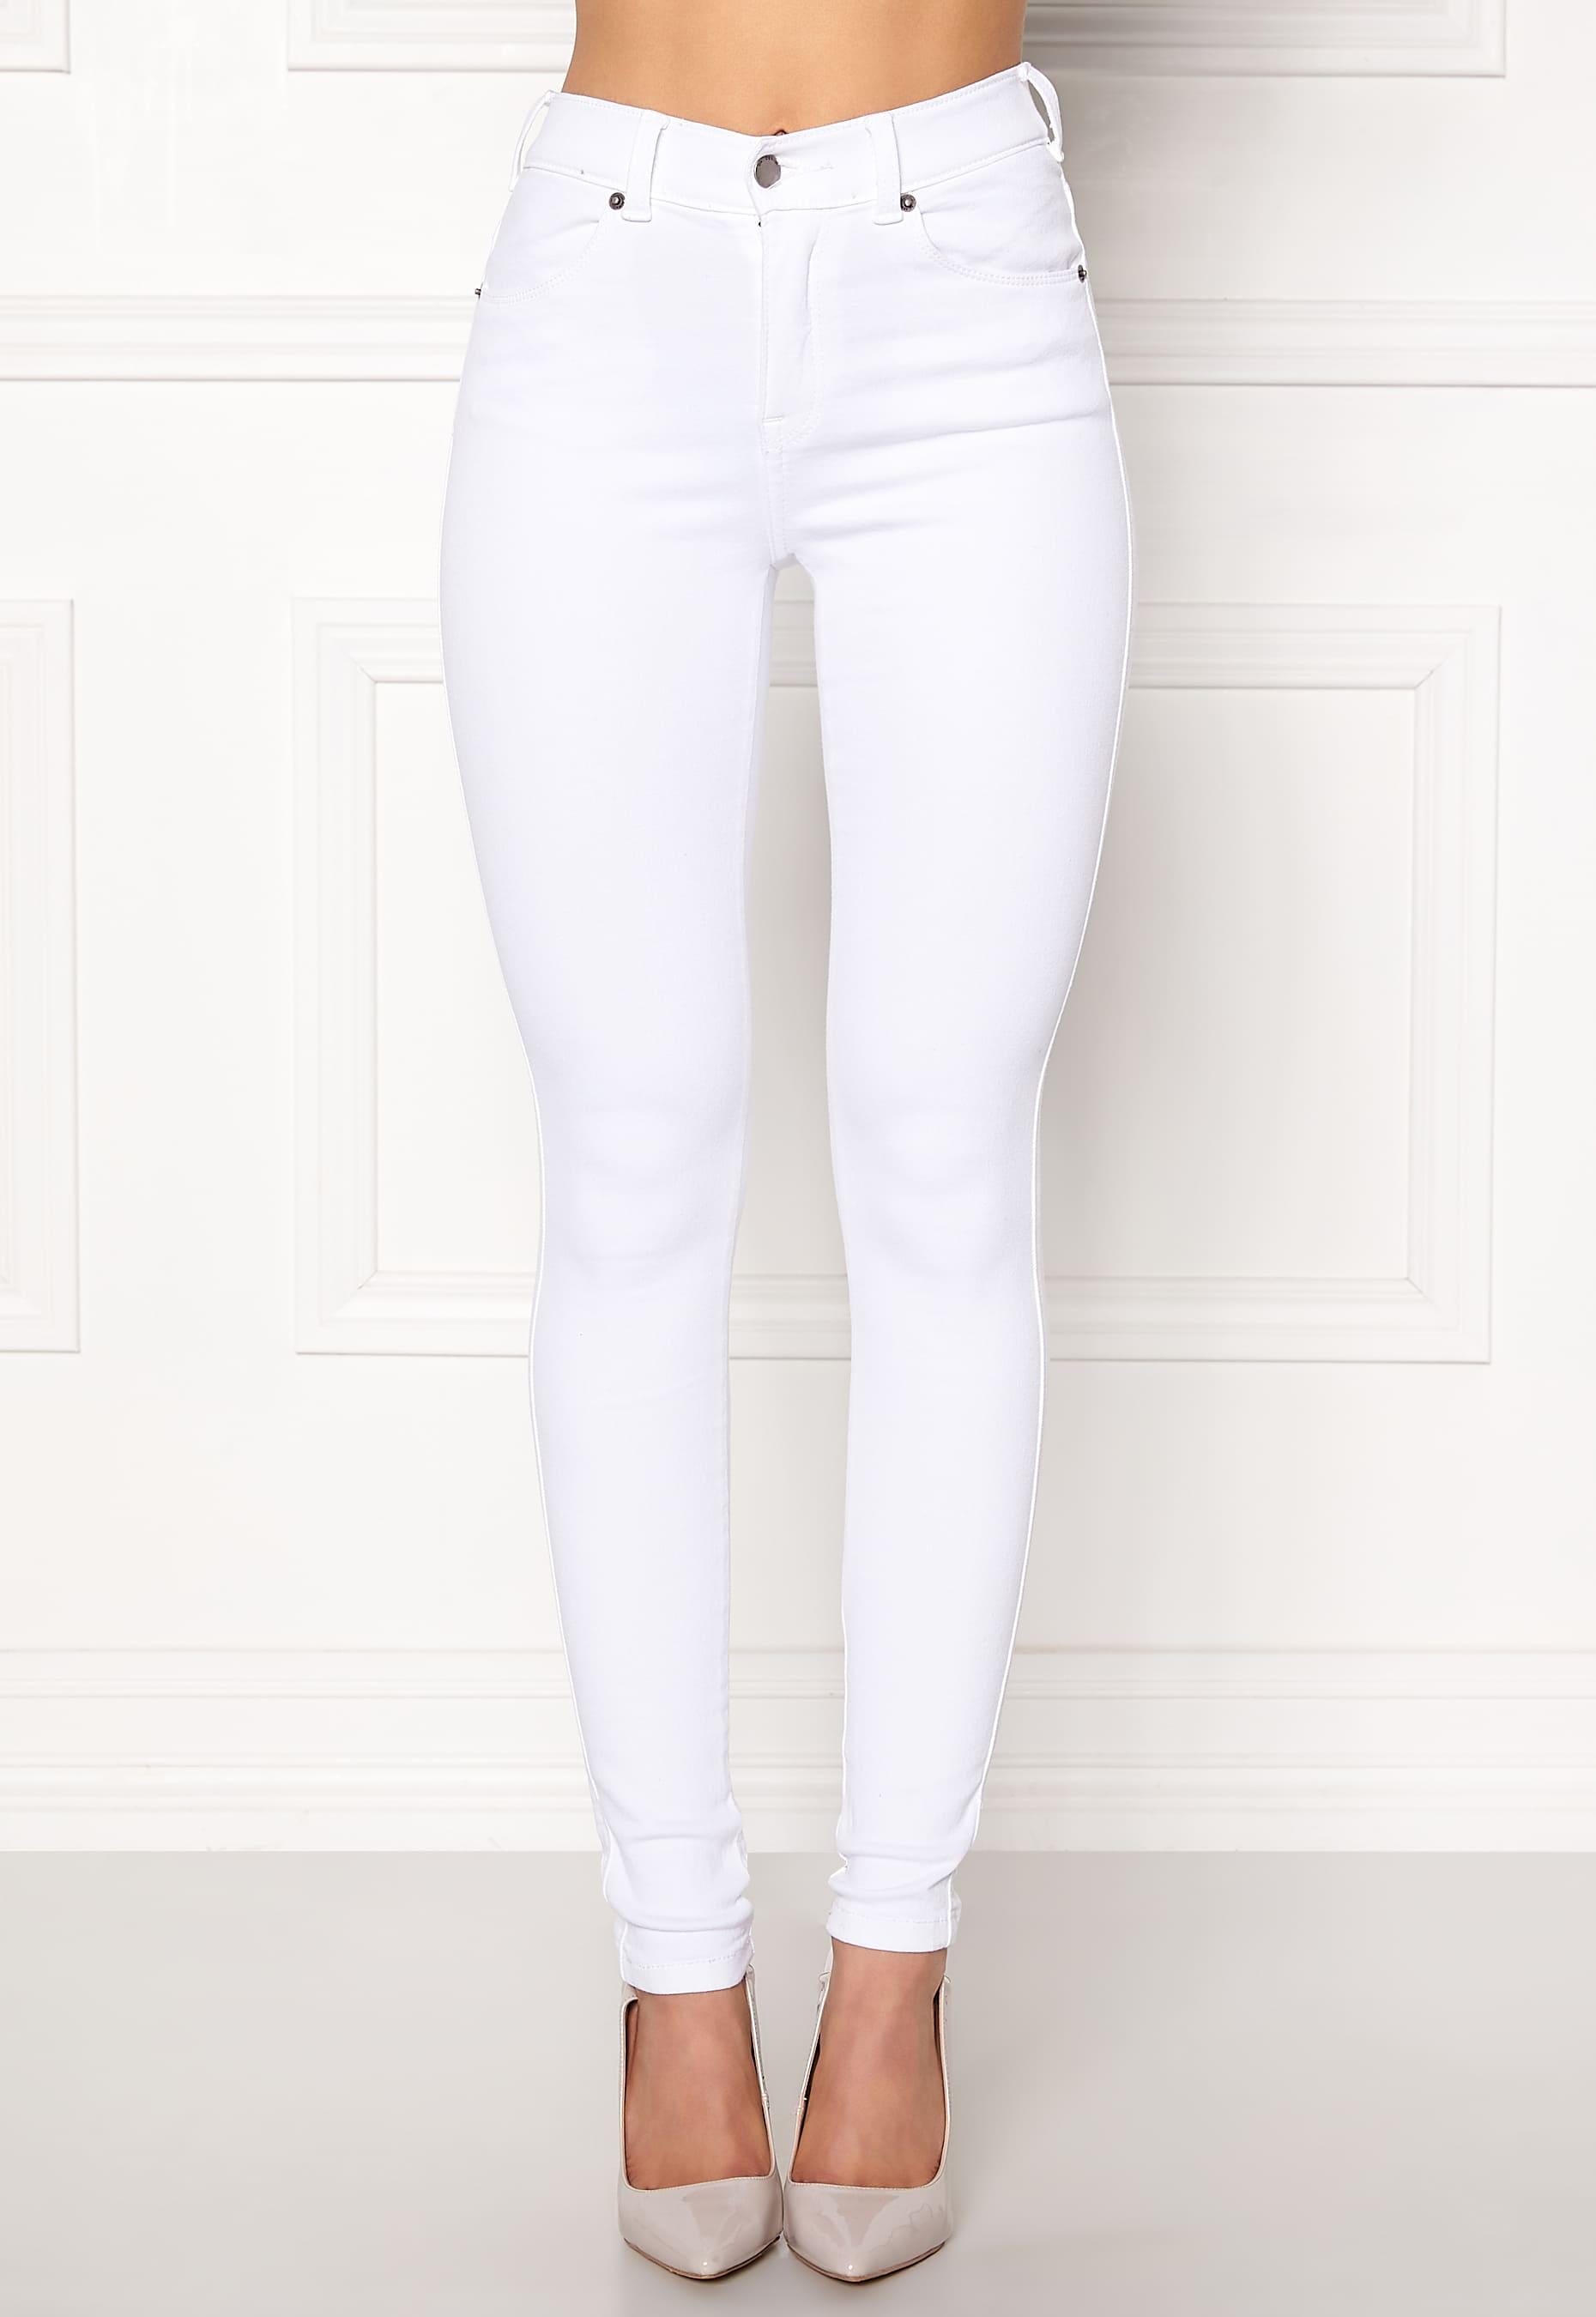 Vita jeans i skinny fit från Dr Denim